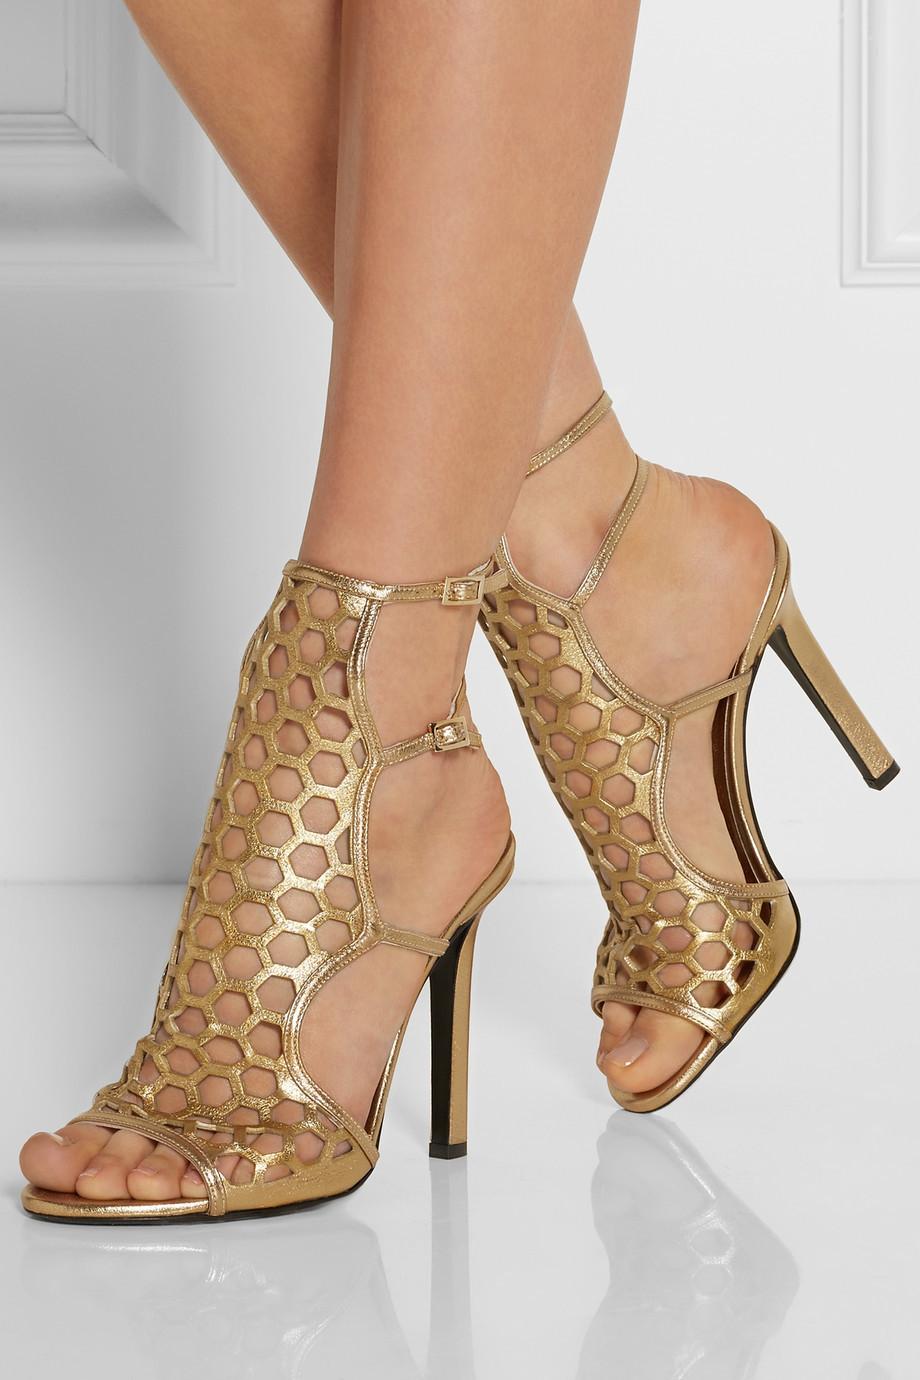 Toe Strap Open White Wedding Shoes